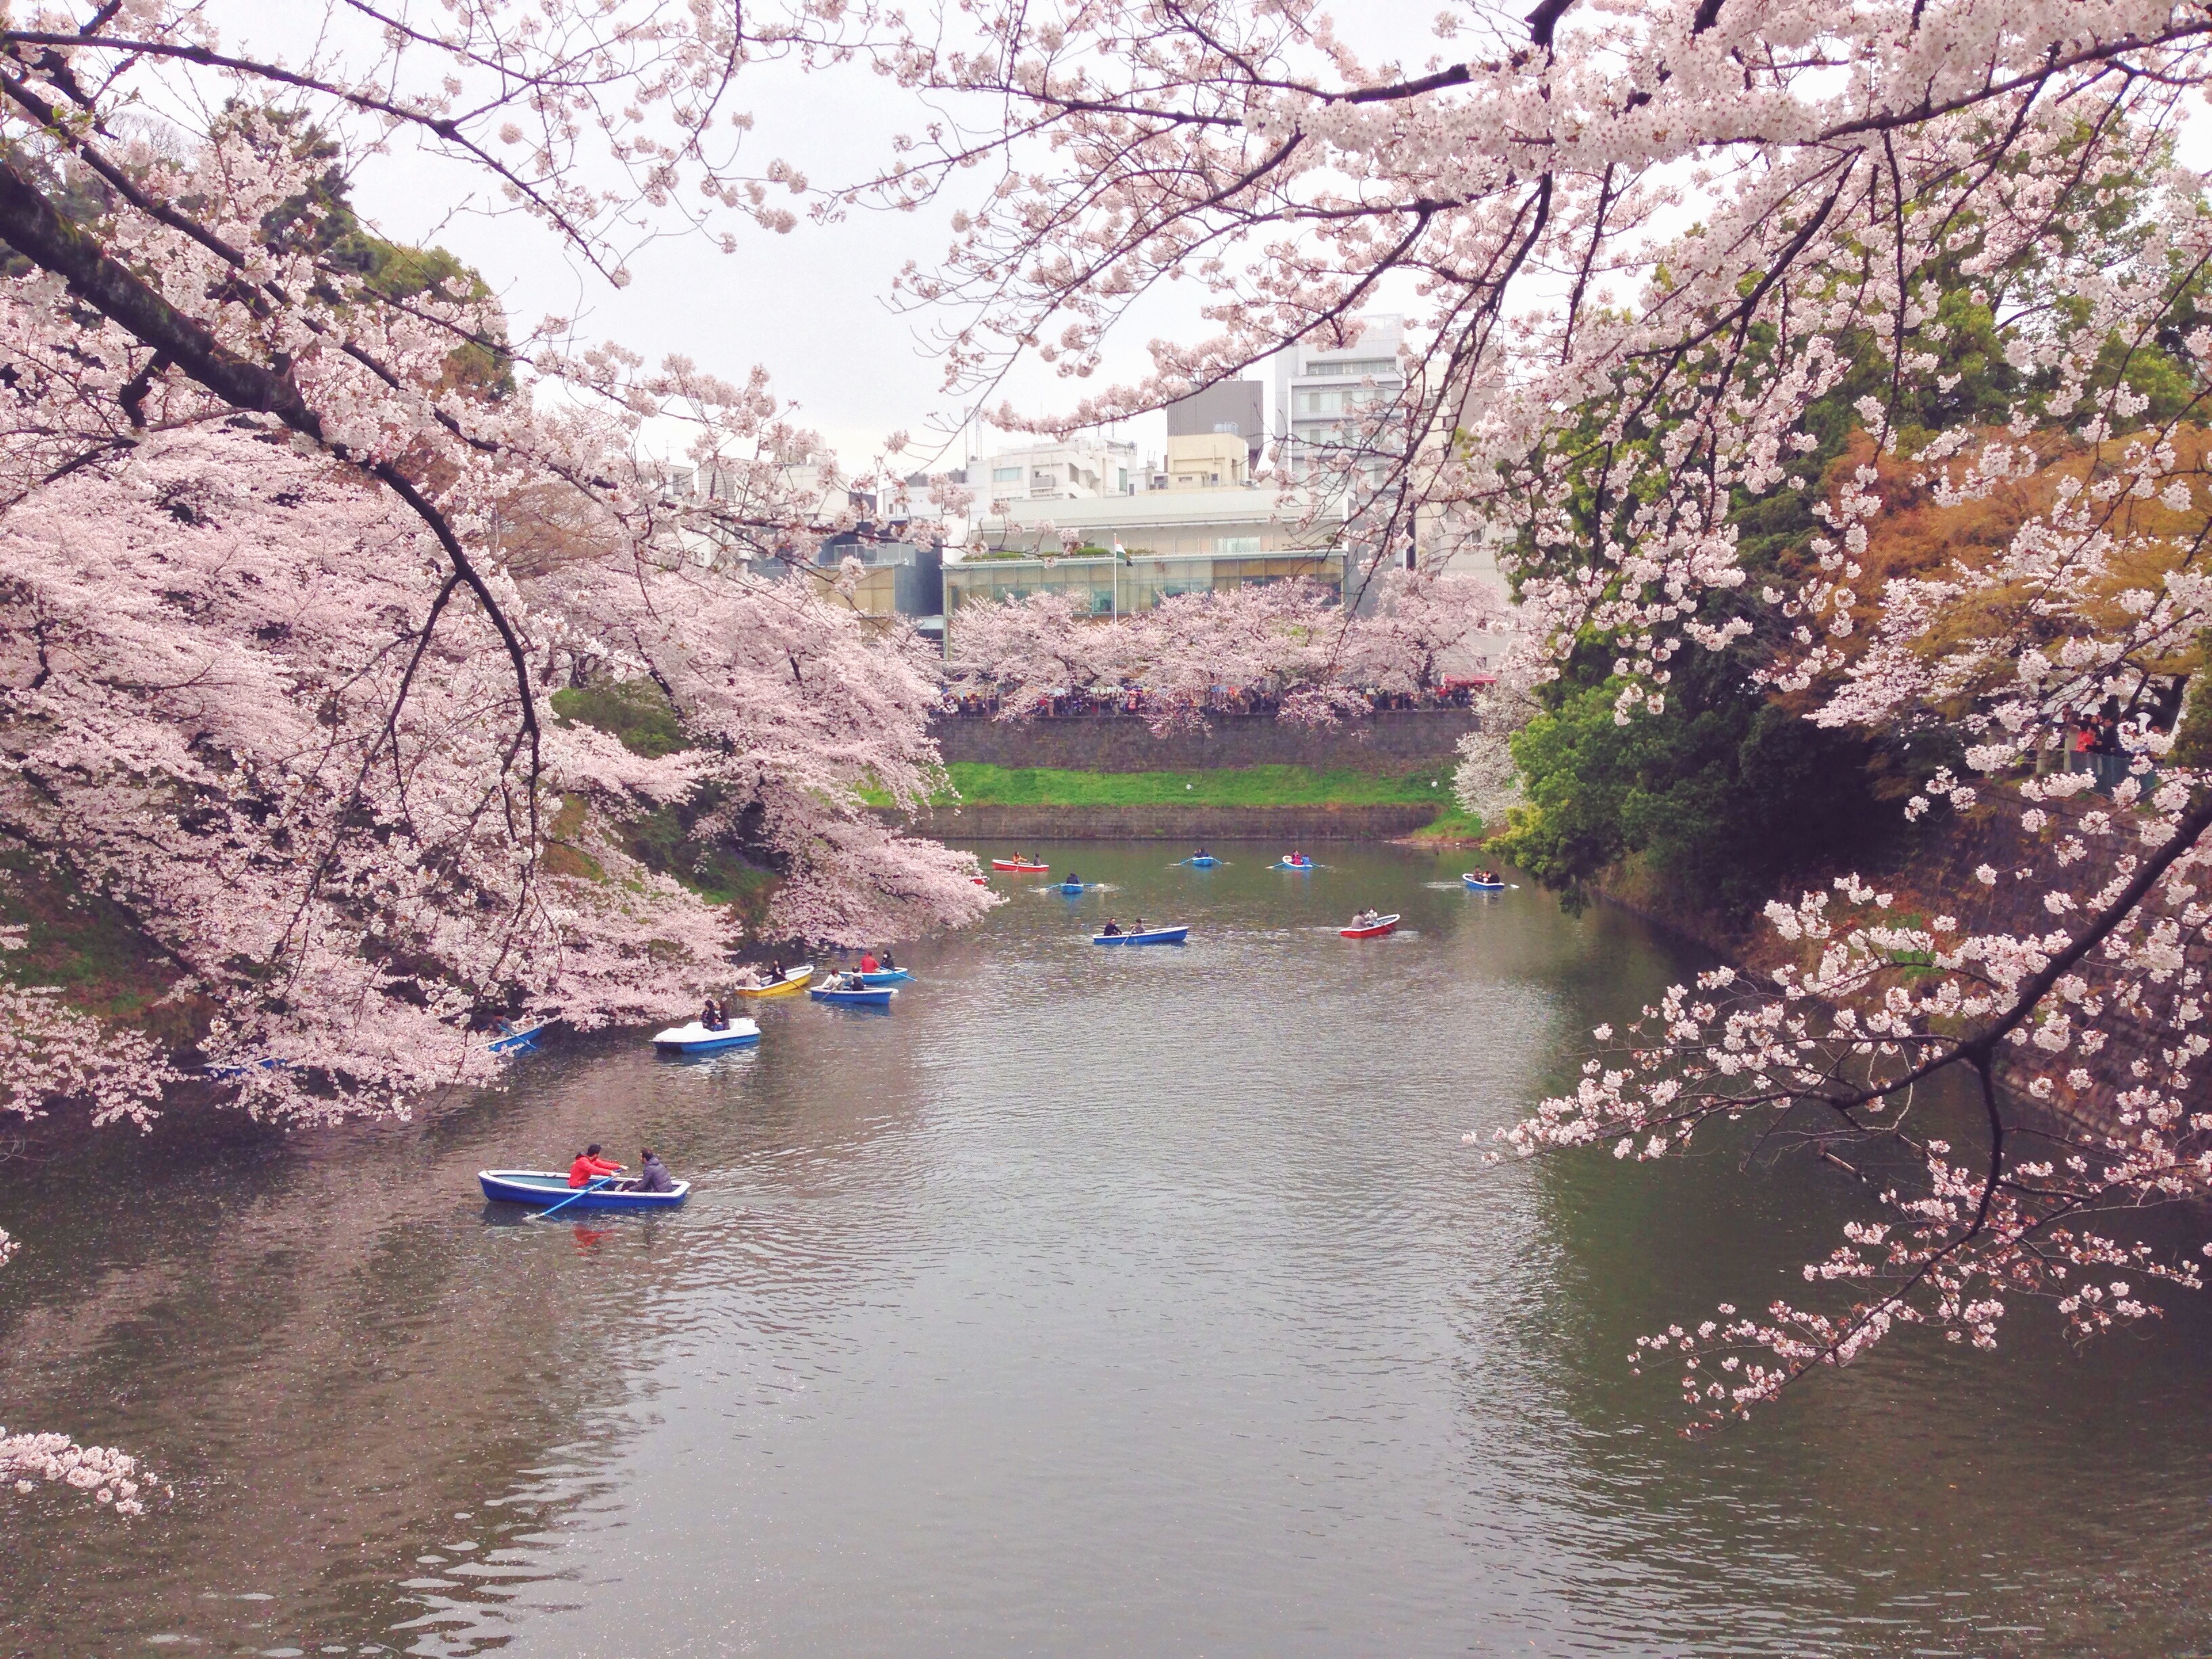 Ciliegi in fiore a Tokyo al Parco Imperiale in Giappone